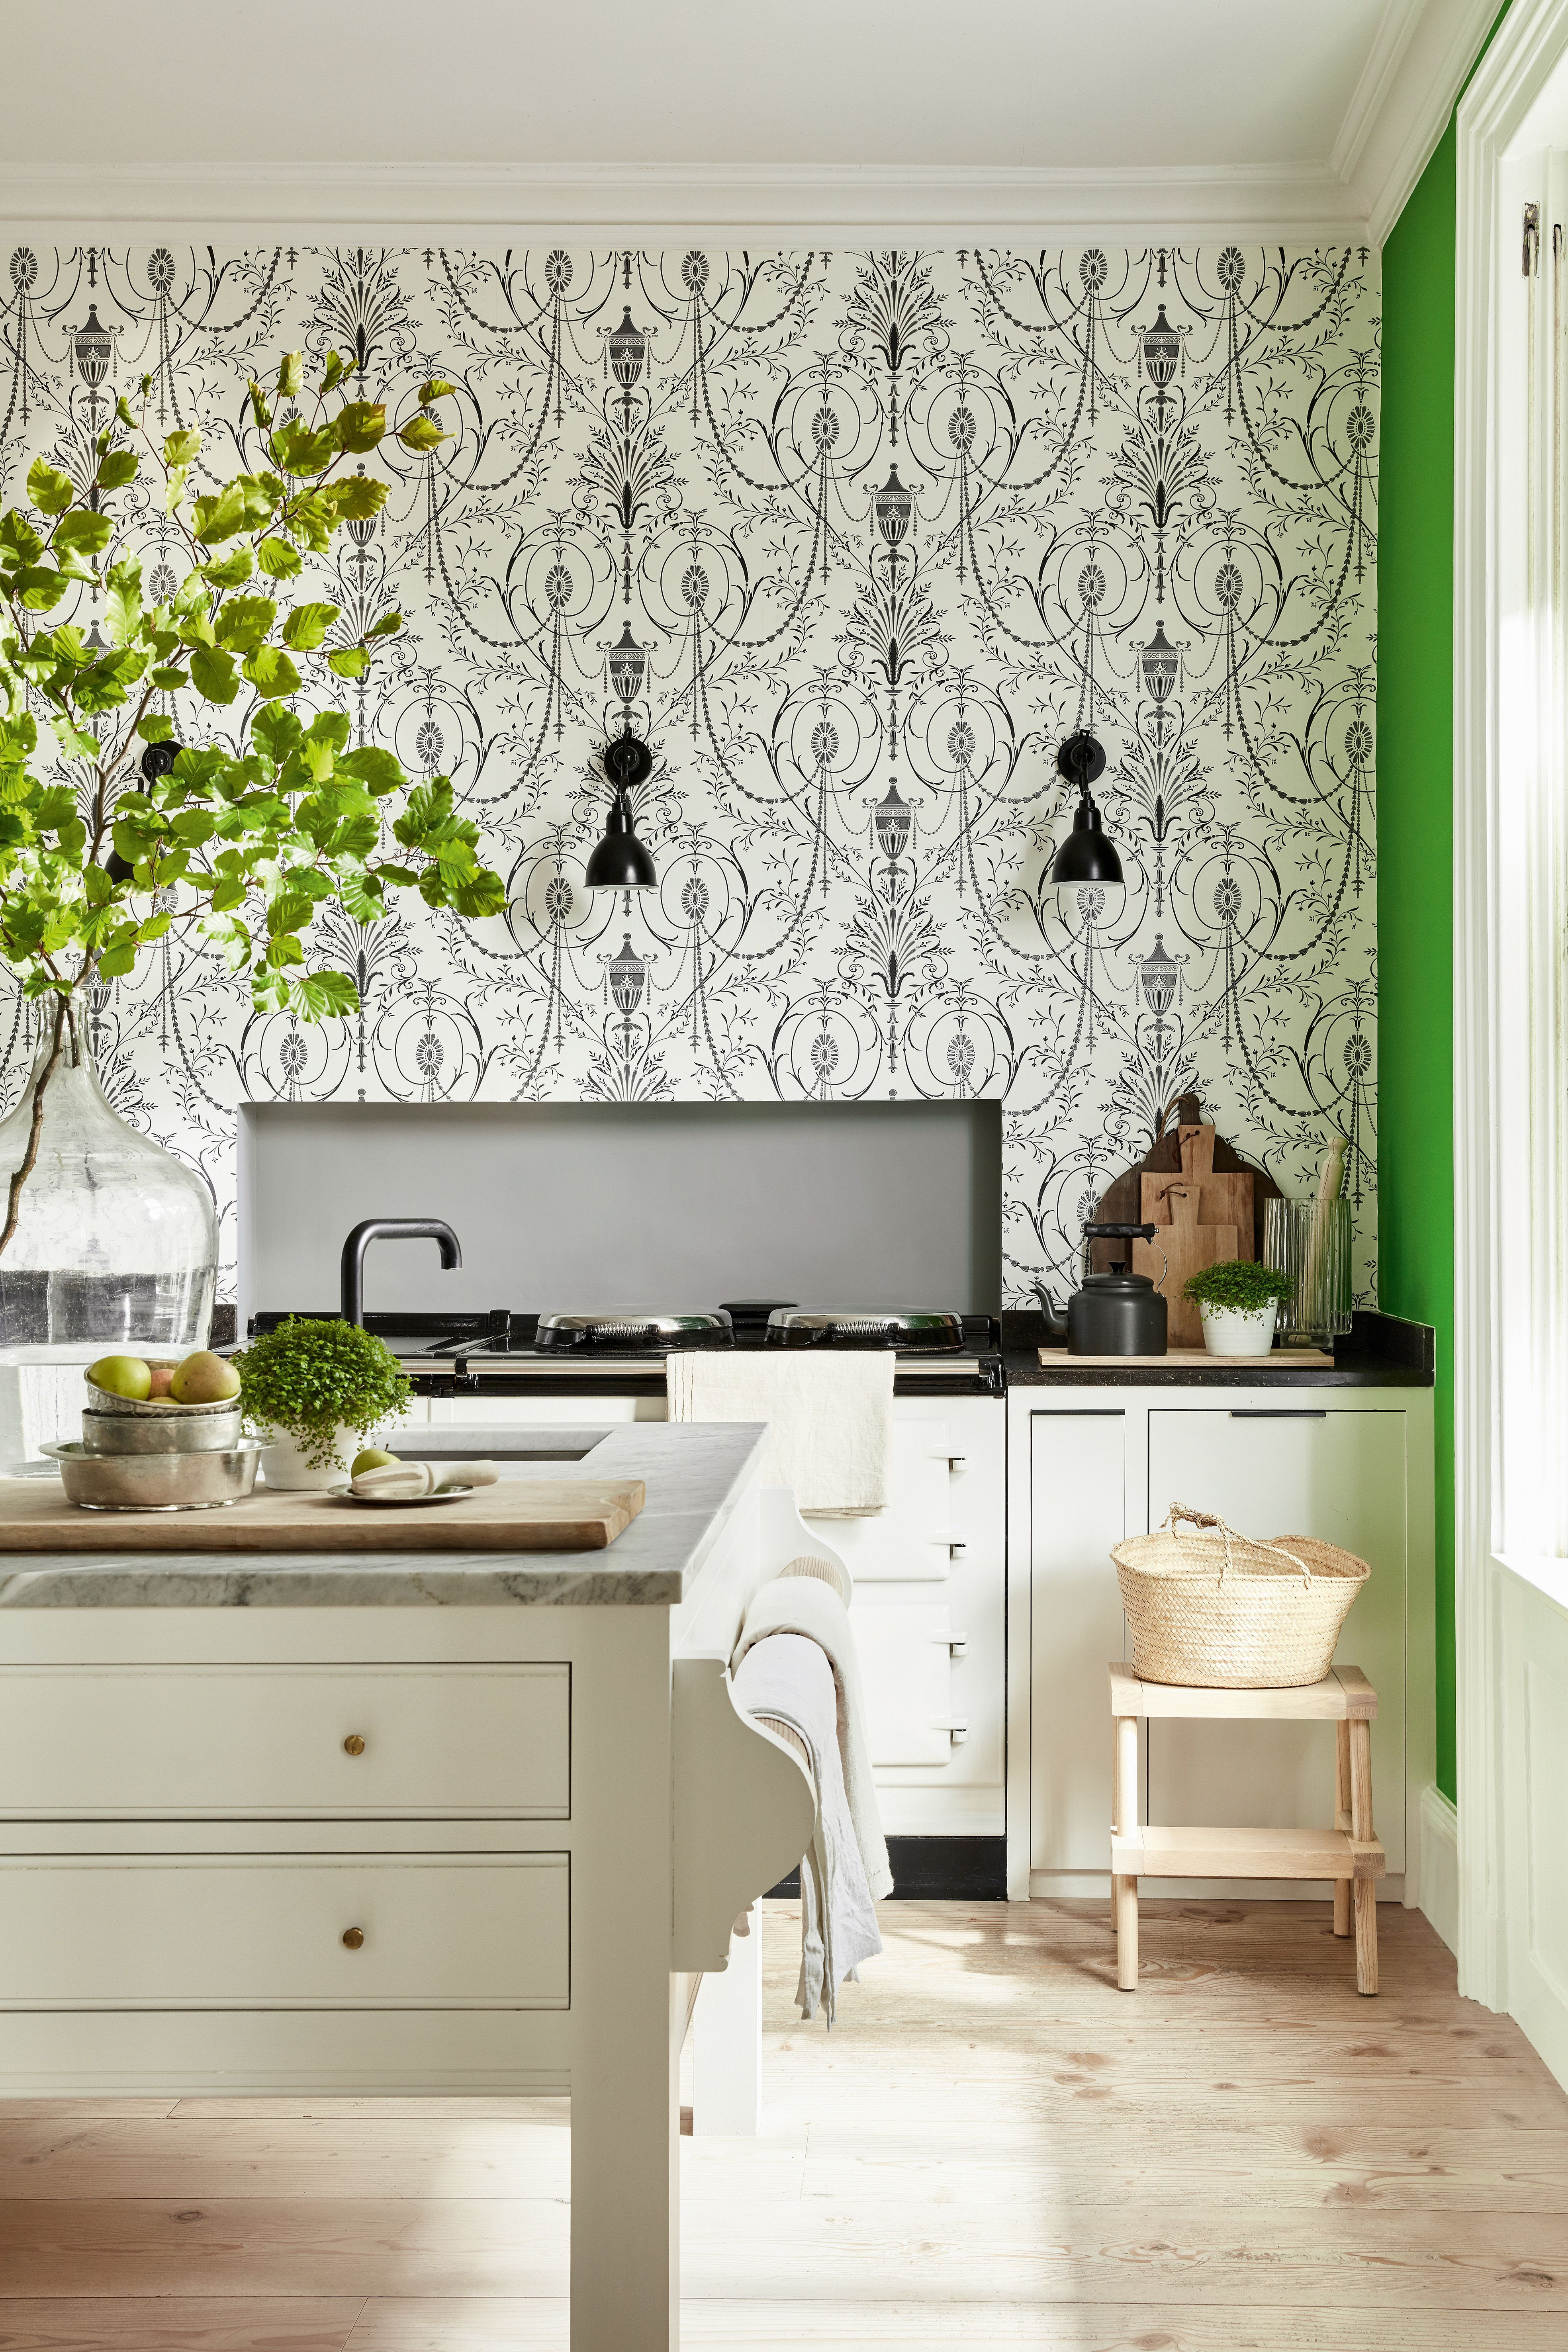 16 Beautiful Kitchen Wallpaper Ideas Kitchen Wallpaper Kitchen Color Trends Wallpaper House Design